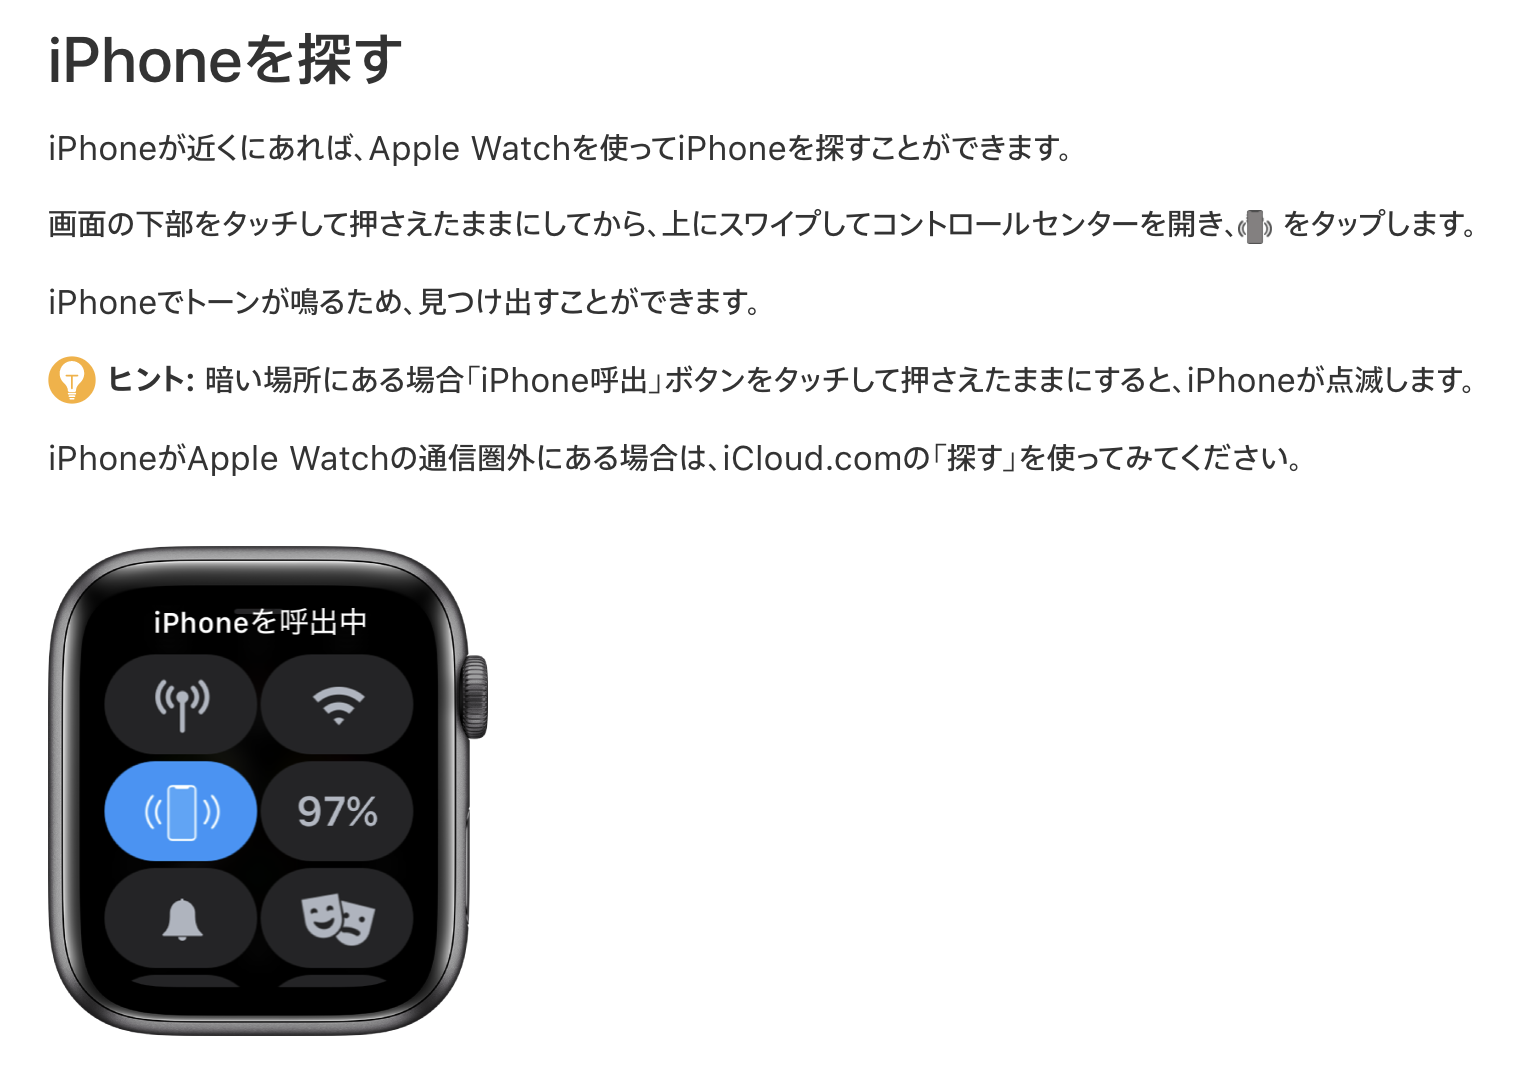 iPhone の捜索